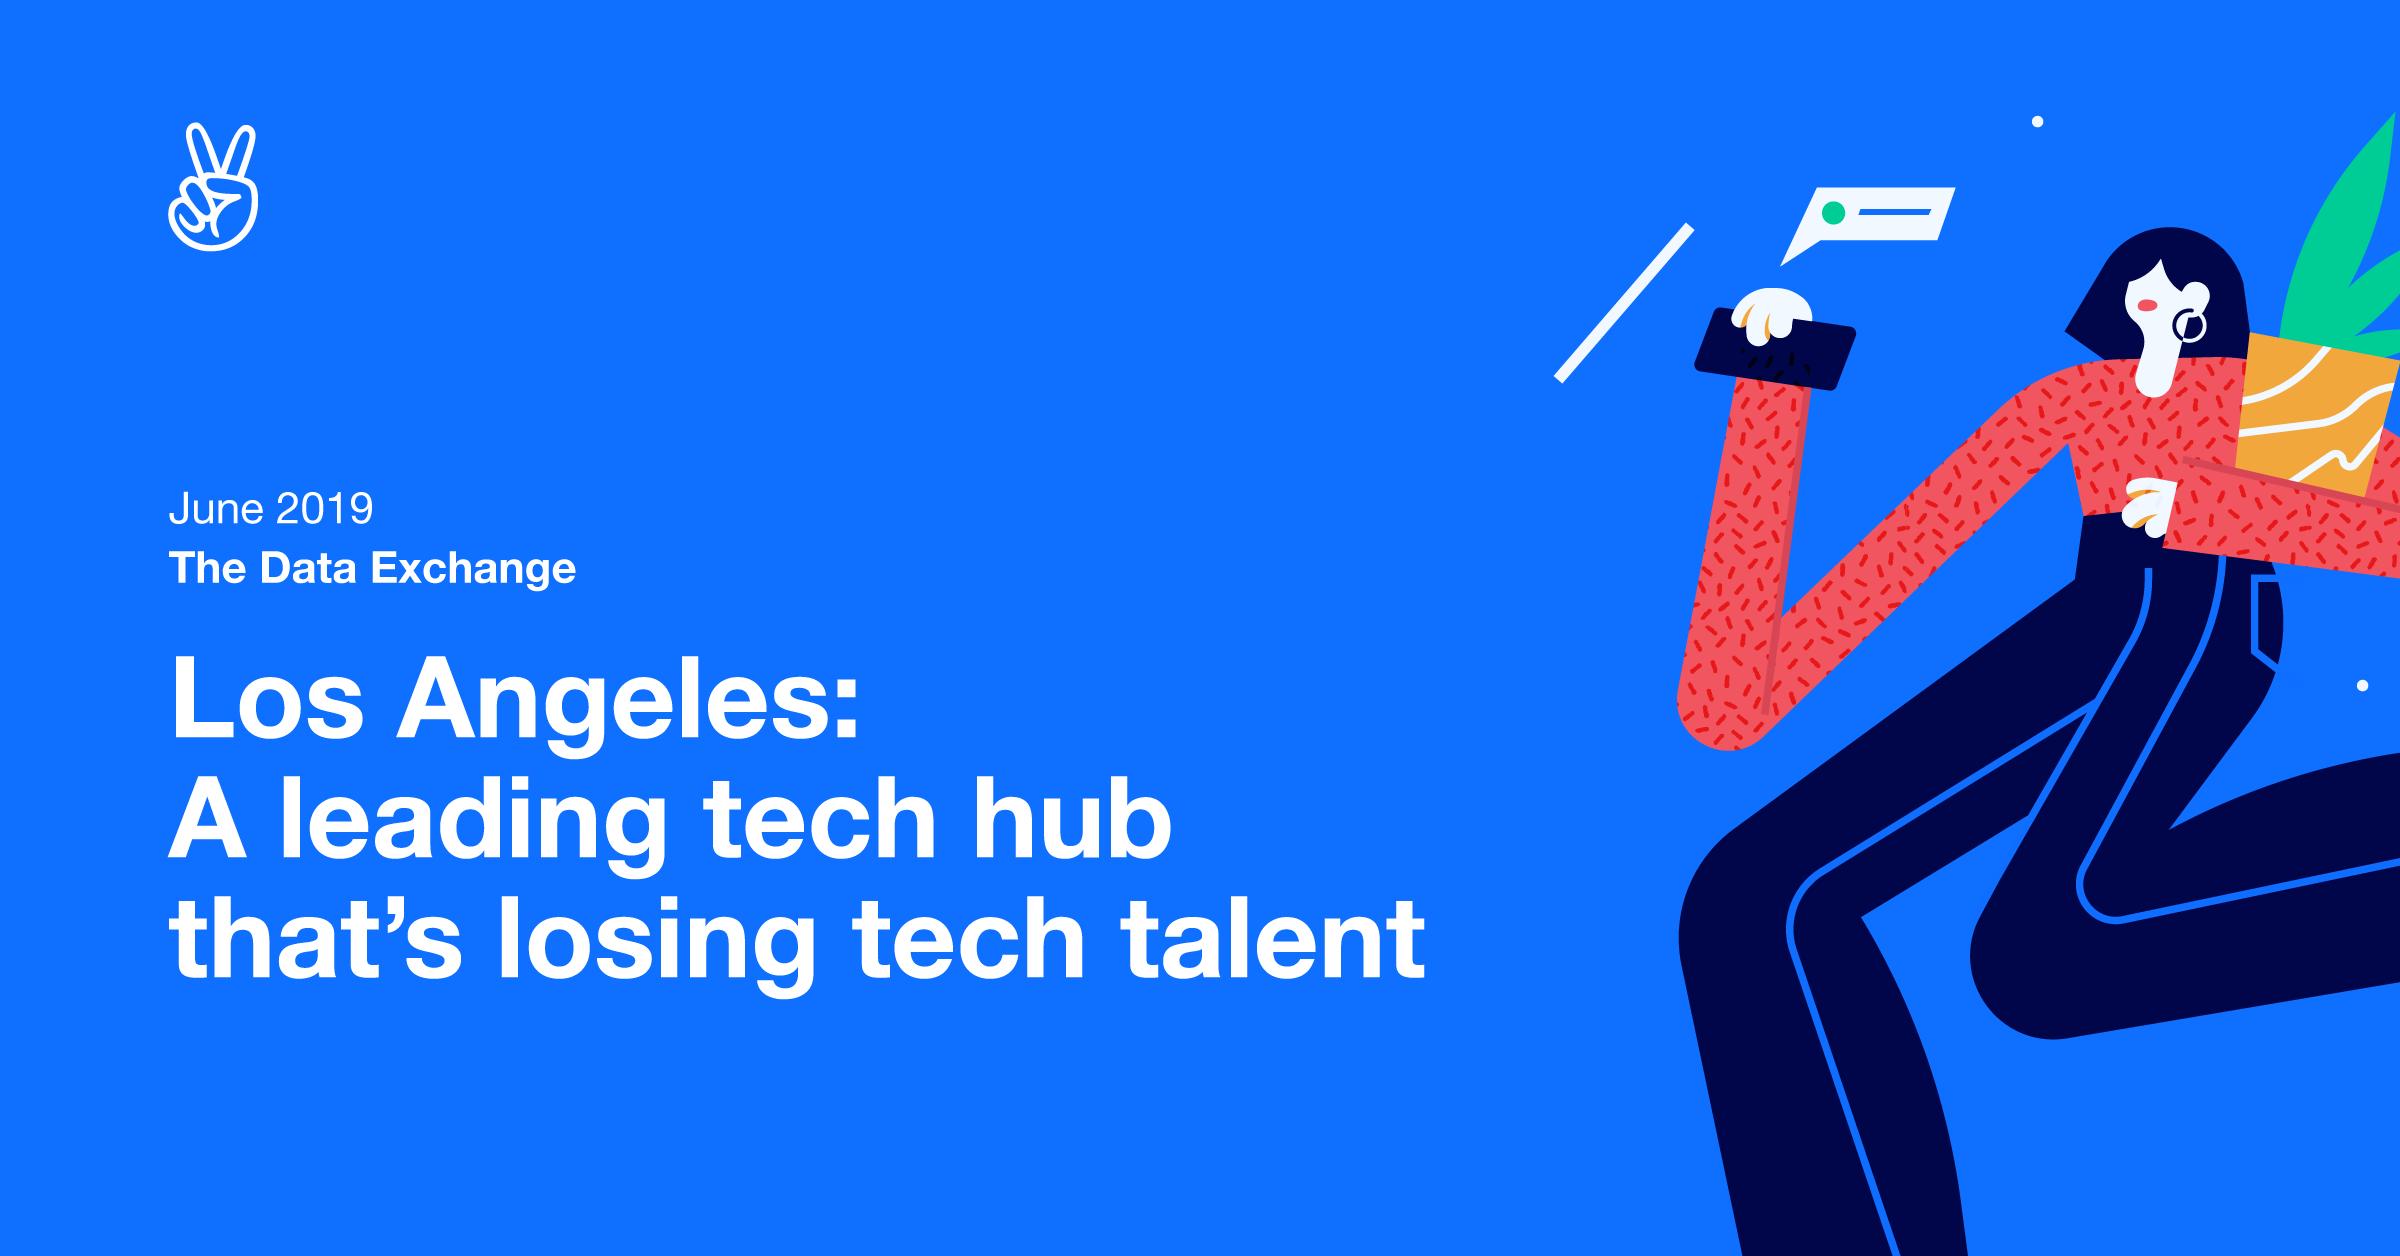 LA: A leading tech hub that's losing tech talent